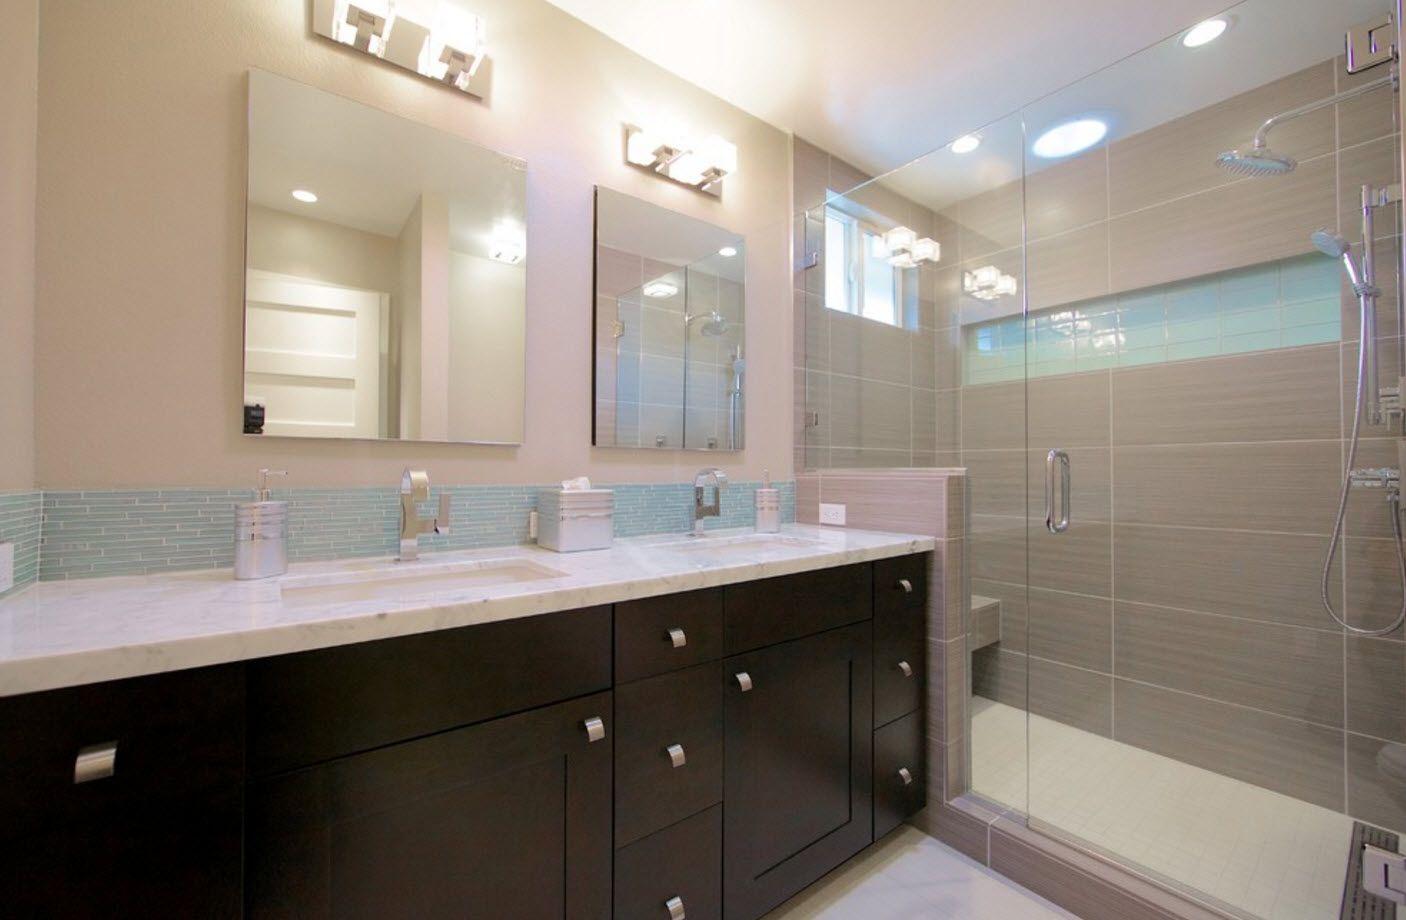 Bathroom Design Trends & Decoration Ideas 2017 - Small ...